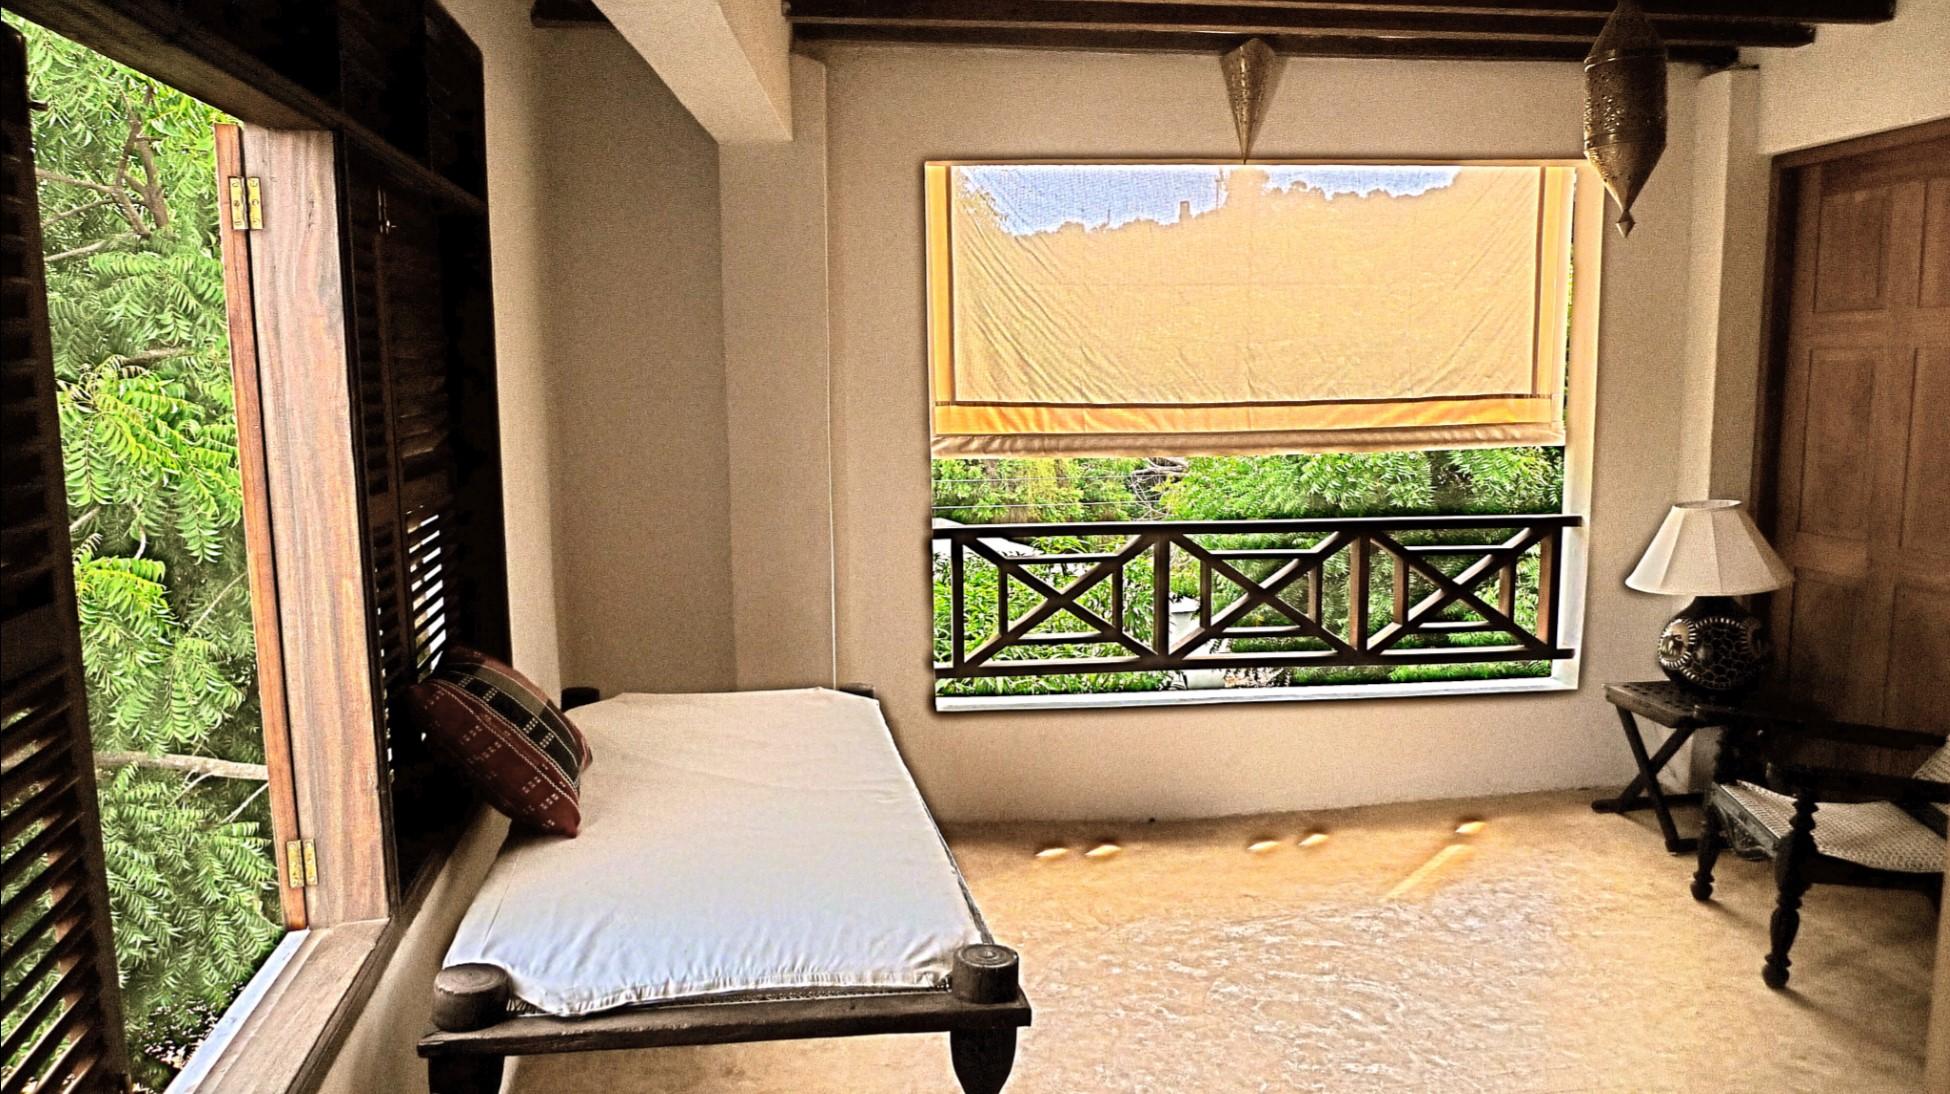 Deule-House-Shela-Lamu-Island-Kenya-Balcony-Dayroom-1.jpg